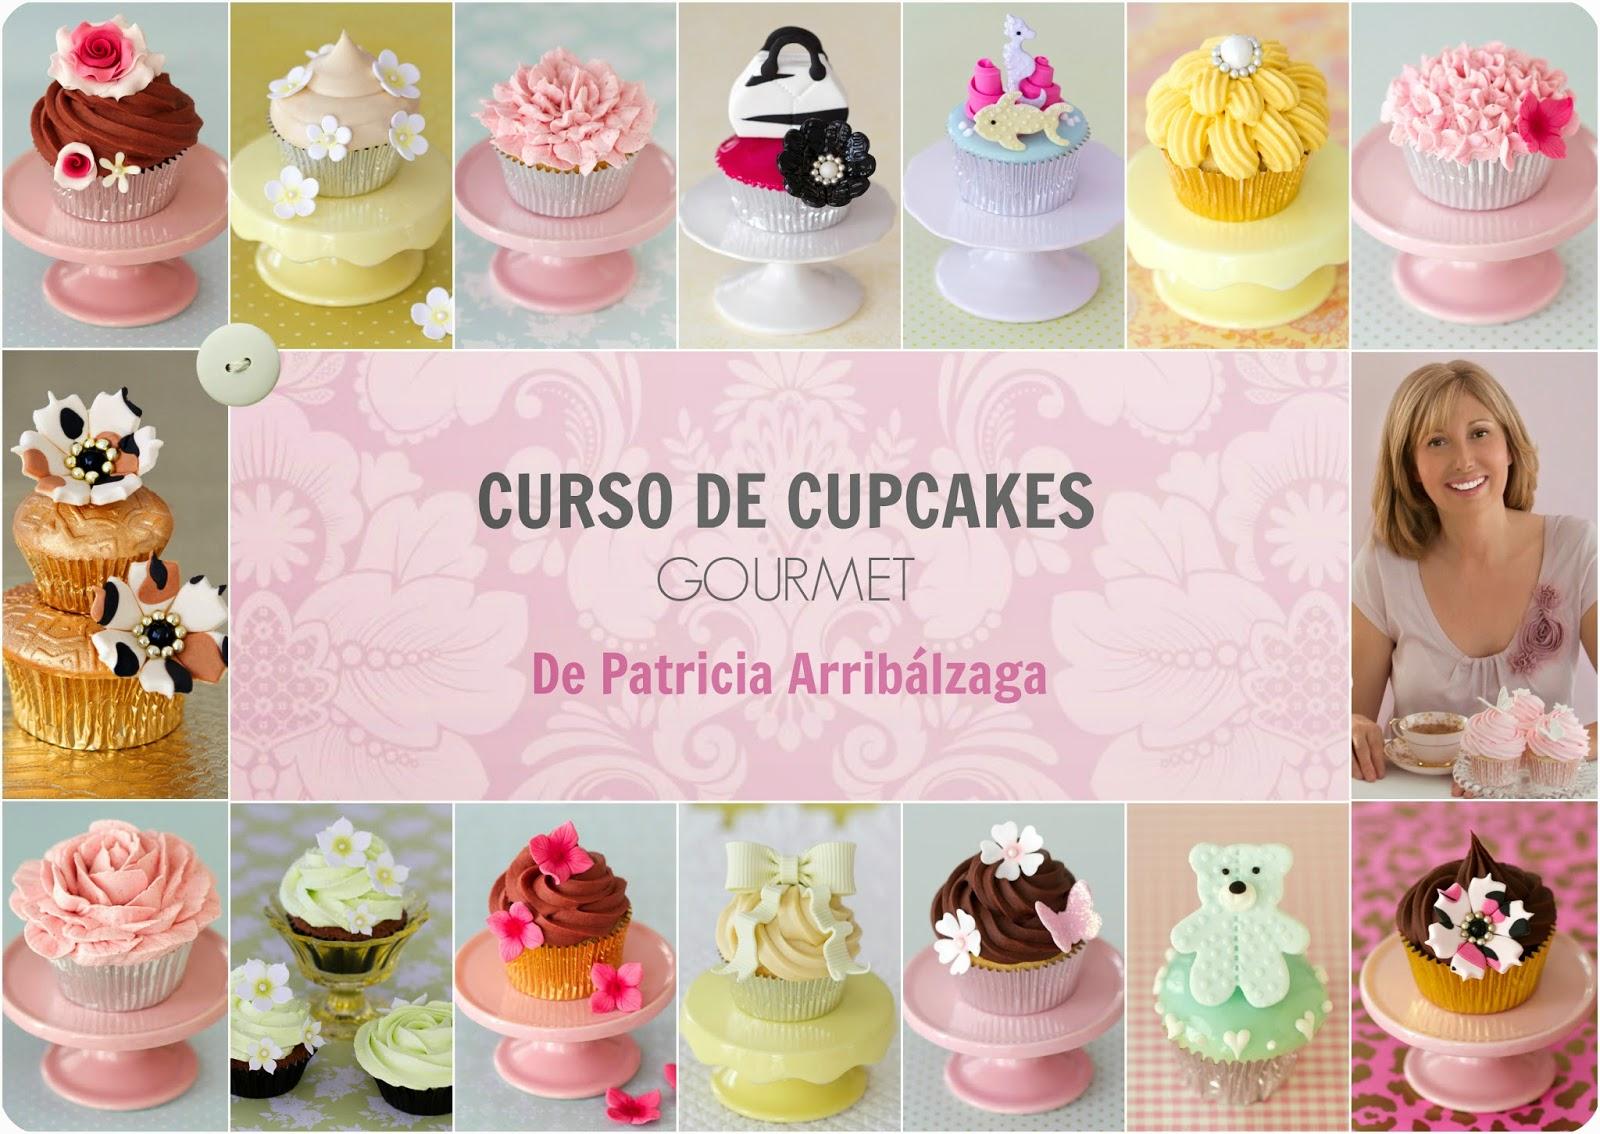 Curso de cupcakes gourmet online